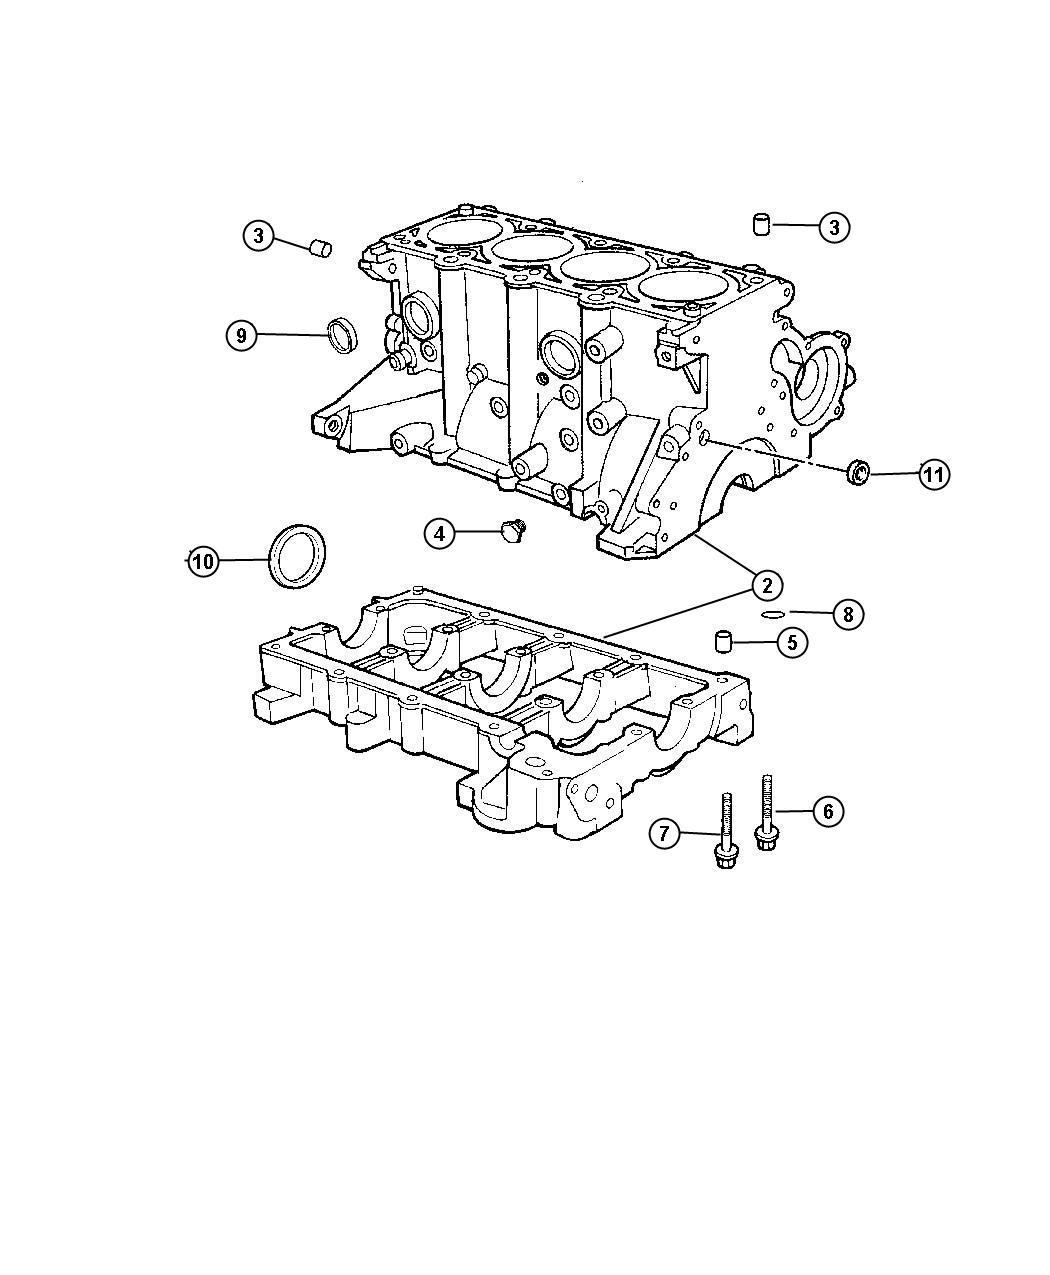 Dodge Neon Block Short Engine Cylinder Sohc